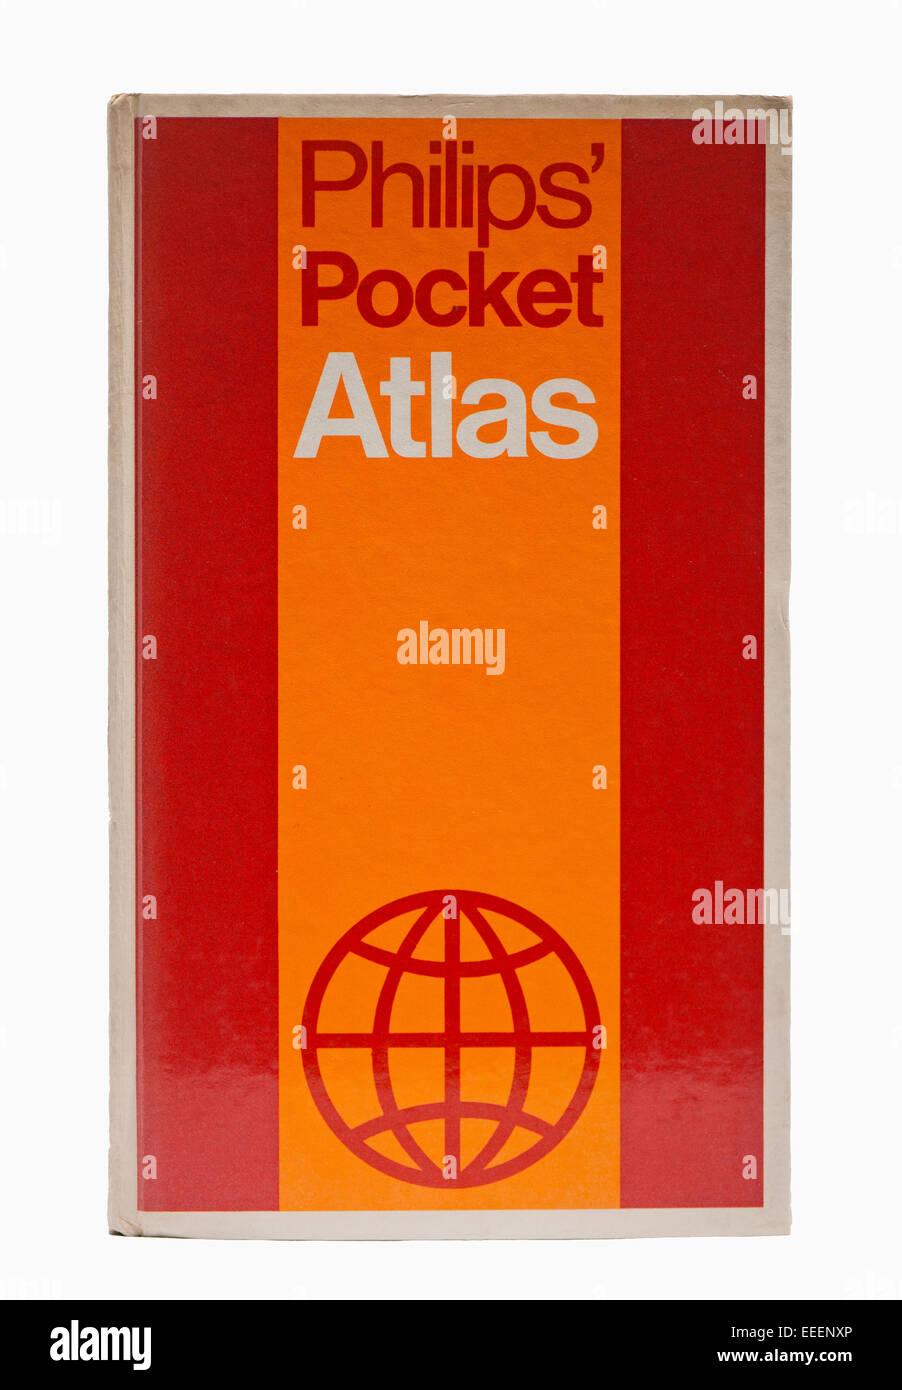 Philips' Pocket Atlas 1977 - Stock Image